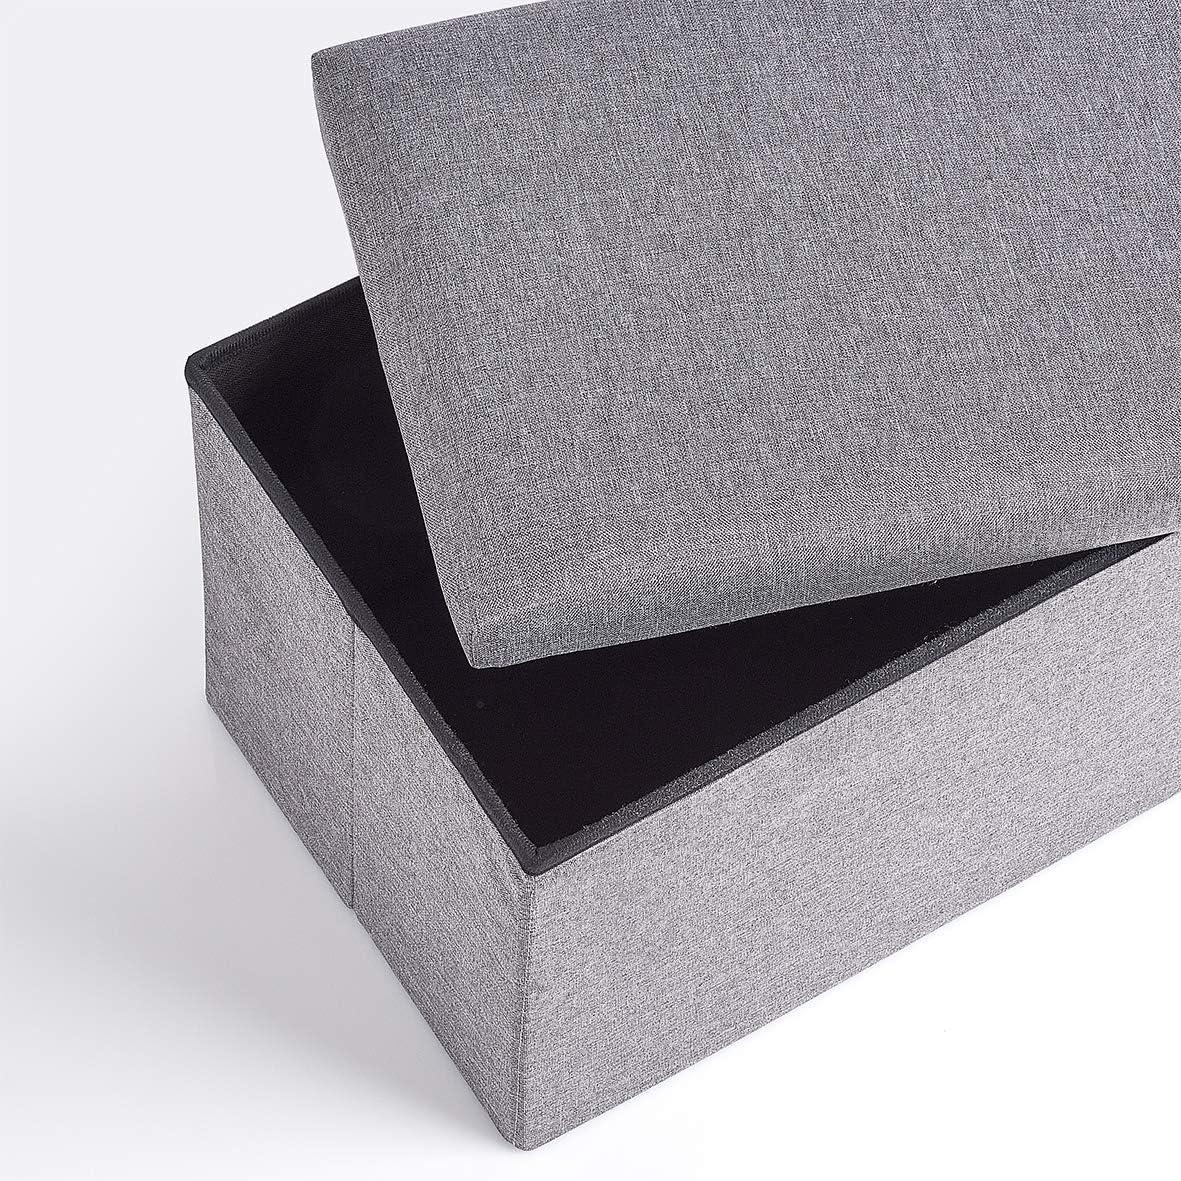 grigio 35 x 35 x 35 cm Zeller Cassapanca in similpelle e MDF